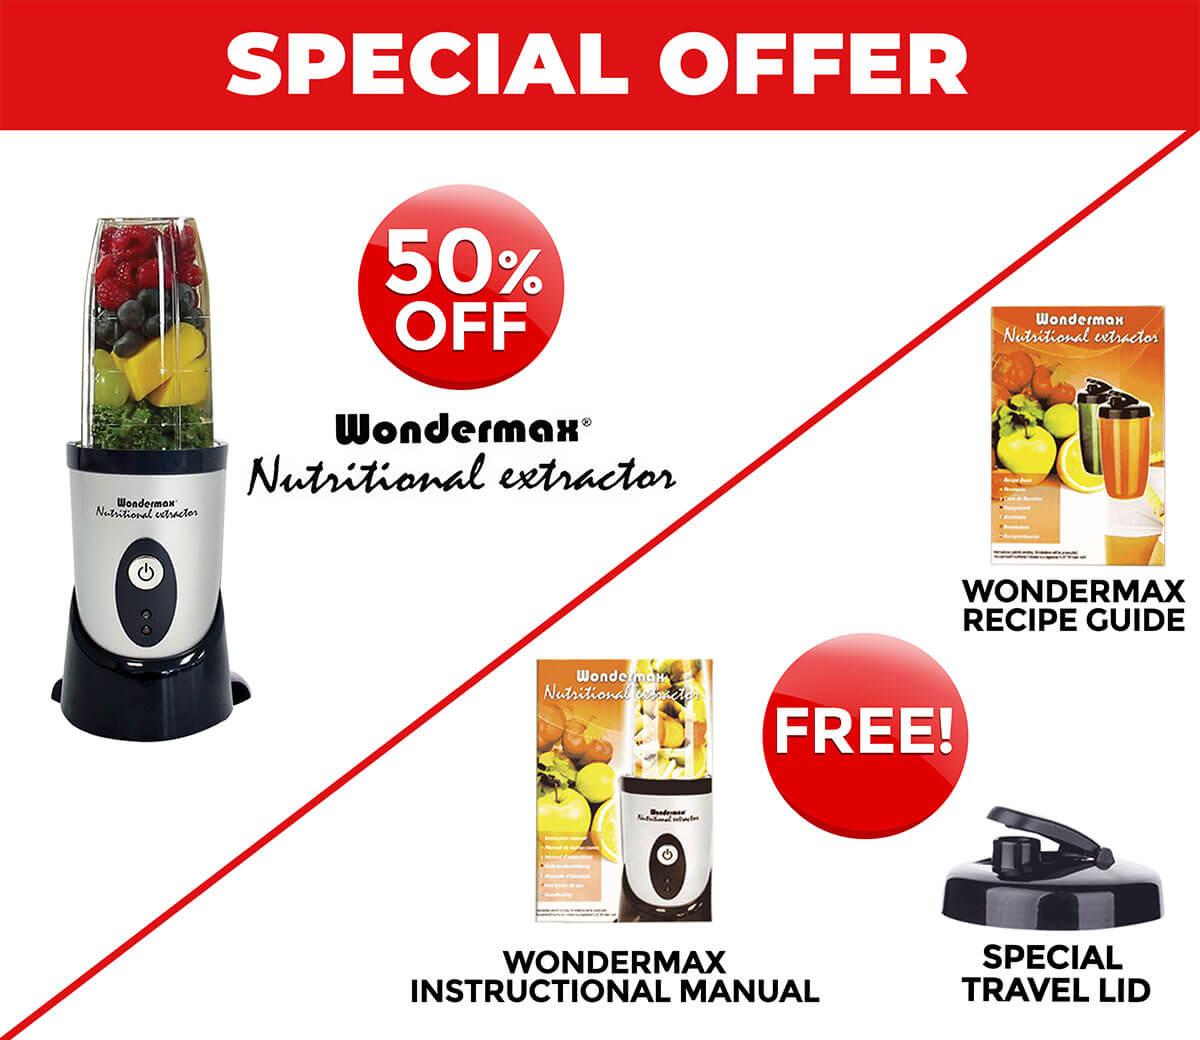 wondermax-special-offer